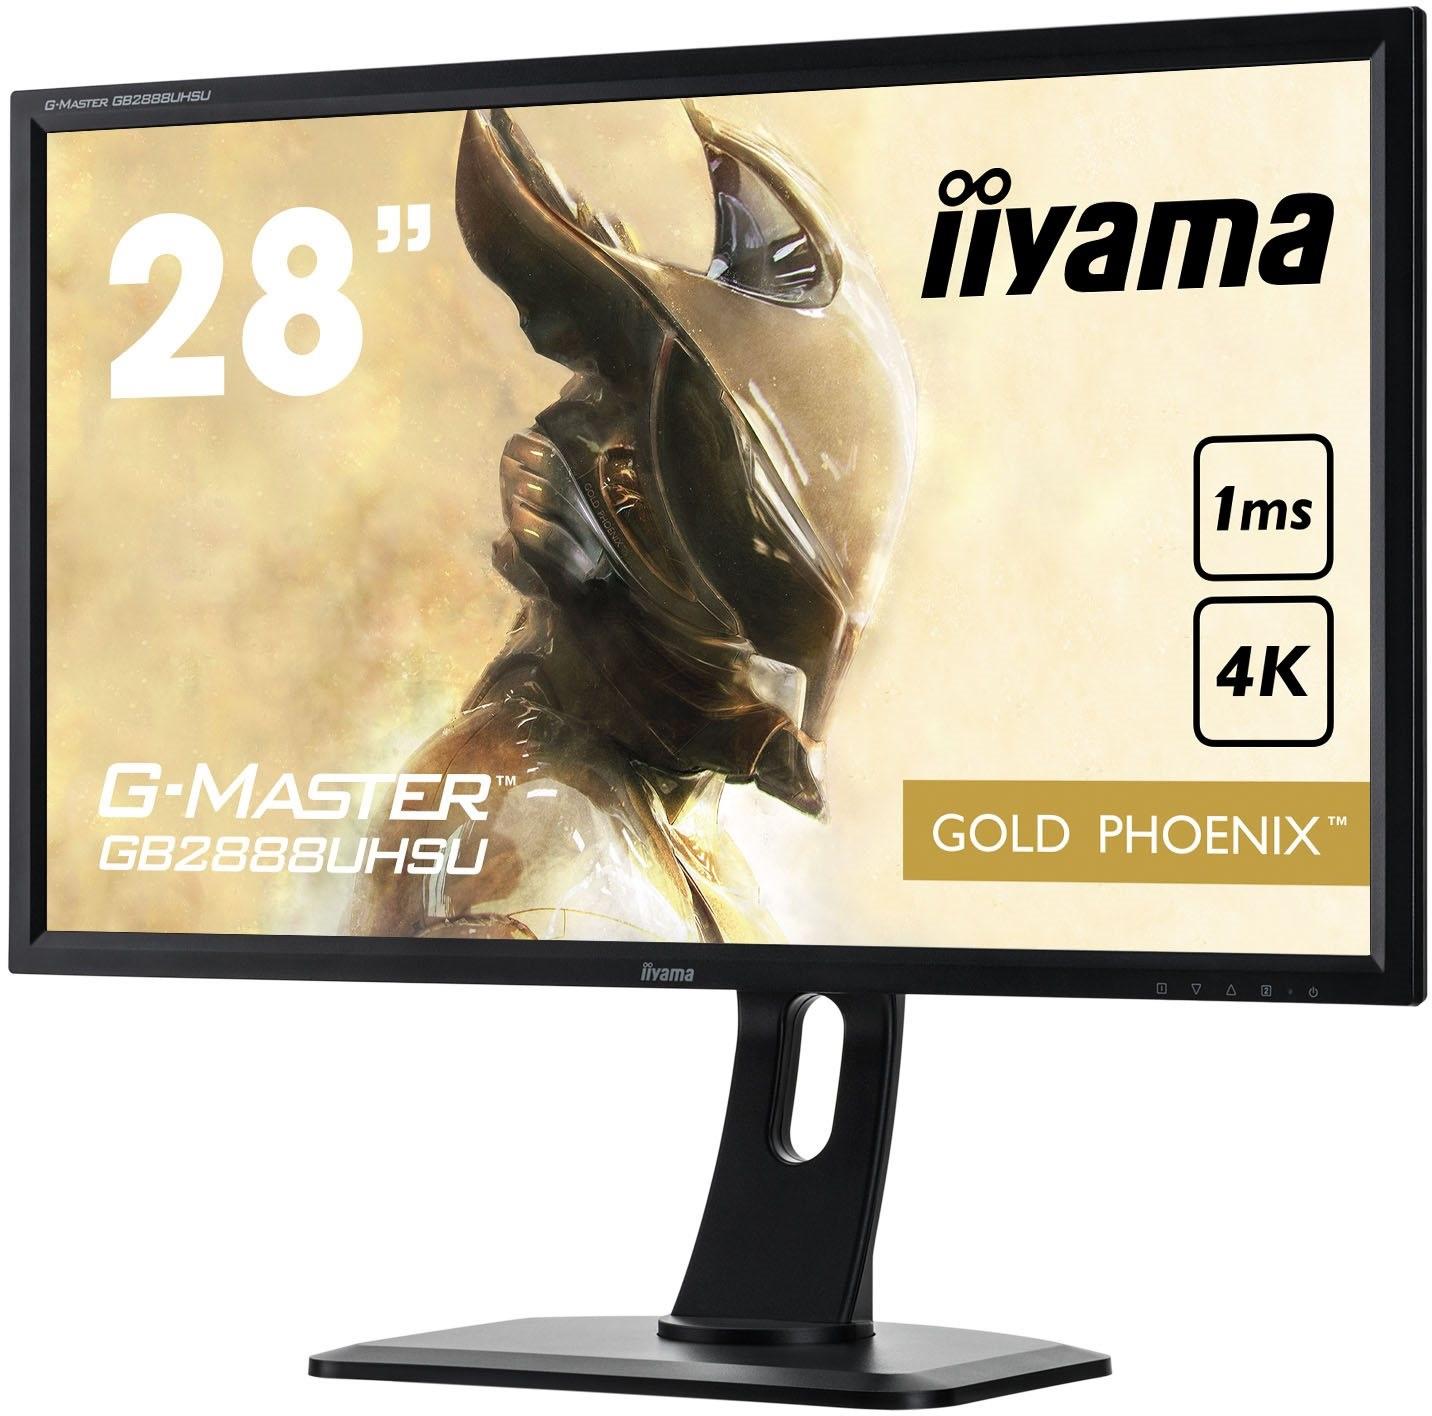 G-MASTER Gold, 4K herní monitor; iiyama; Gold Phoenix